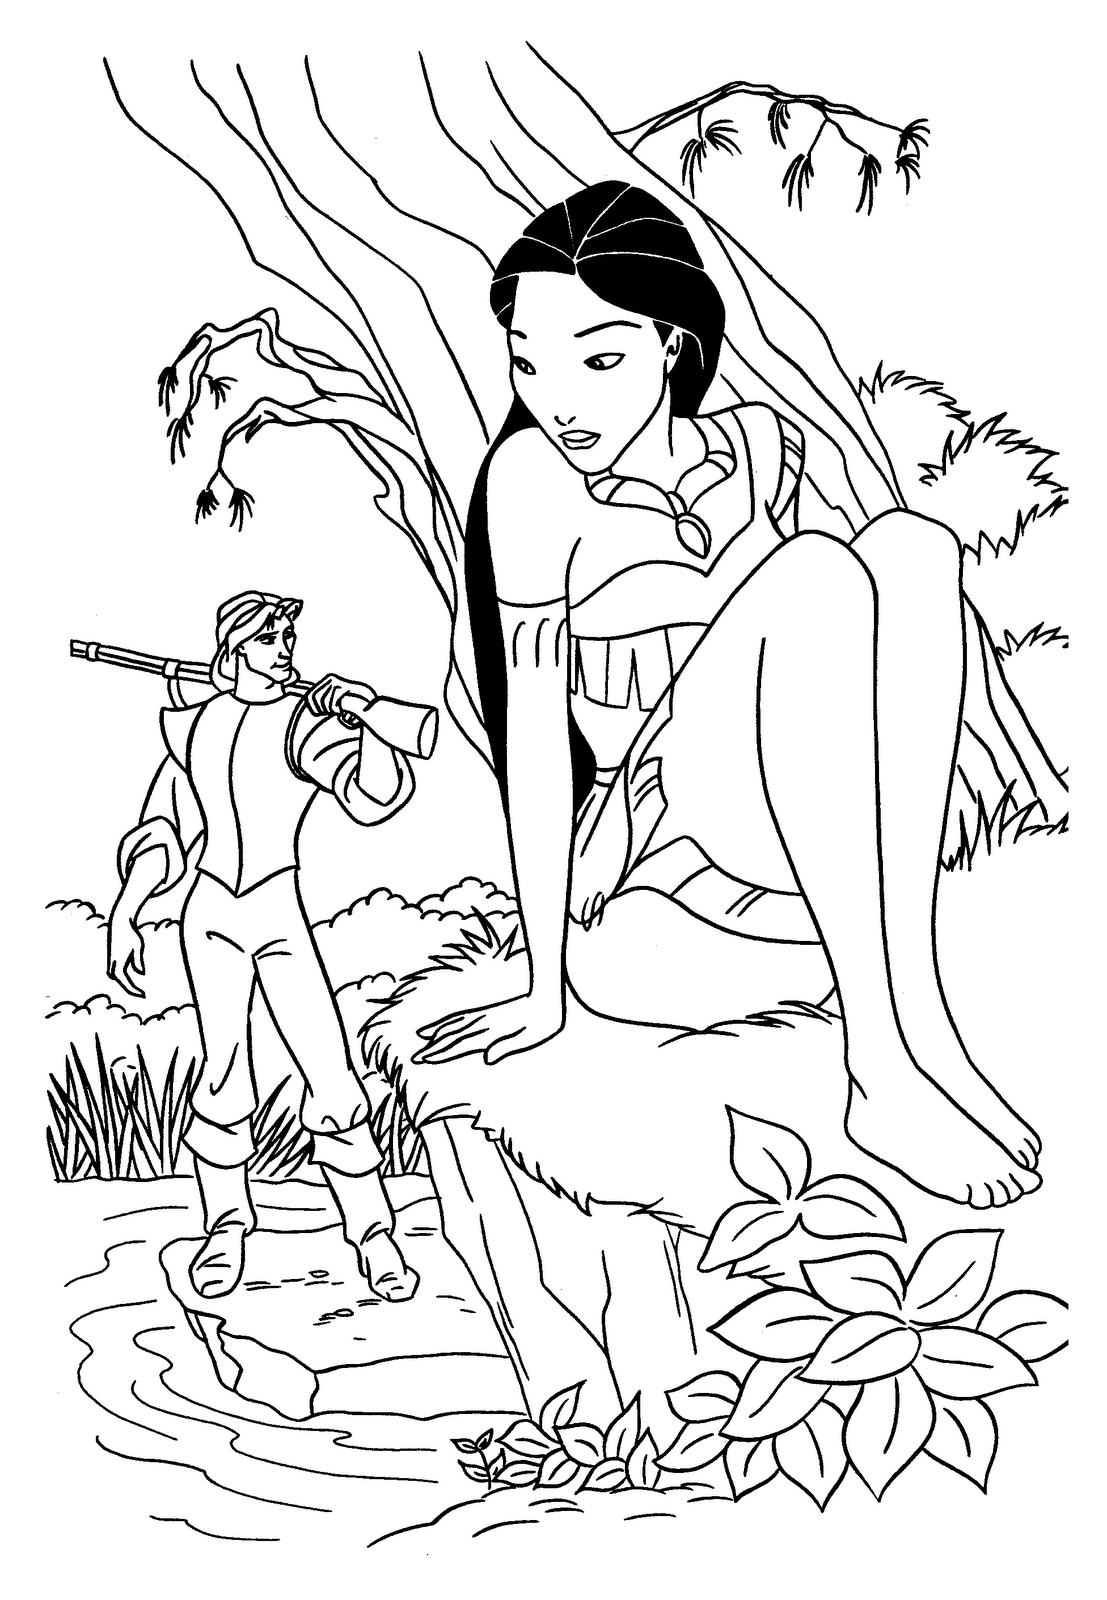 Disneyprincesscoloringpages disney princess pocahontas coloring